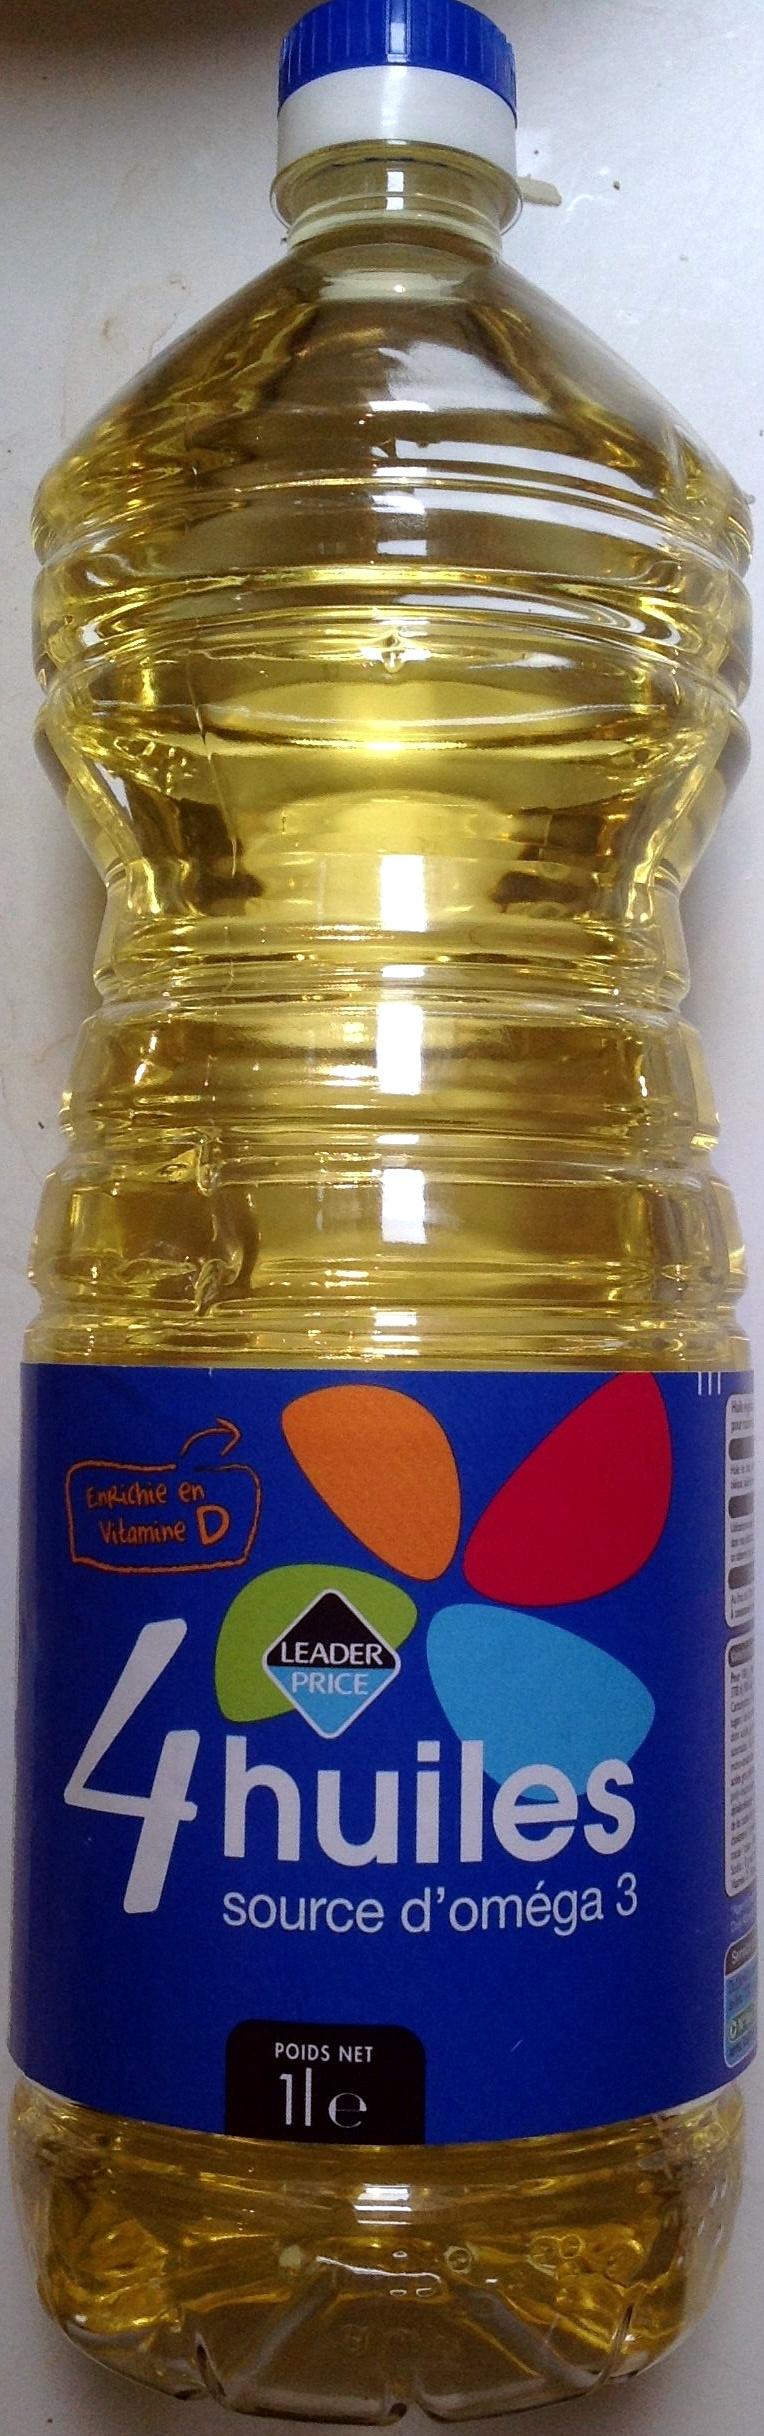 4 huiles, source d'oméga 3 - Prodotto - fr